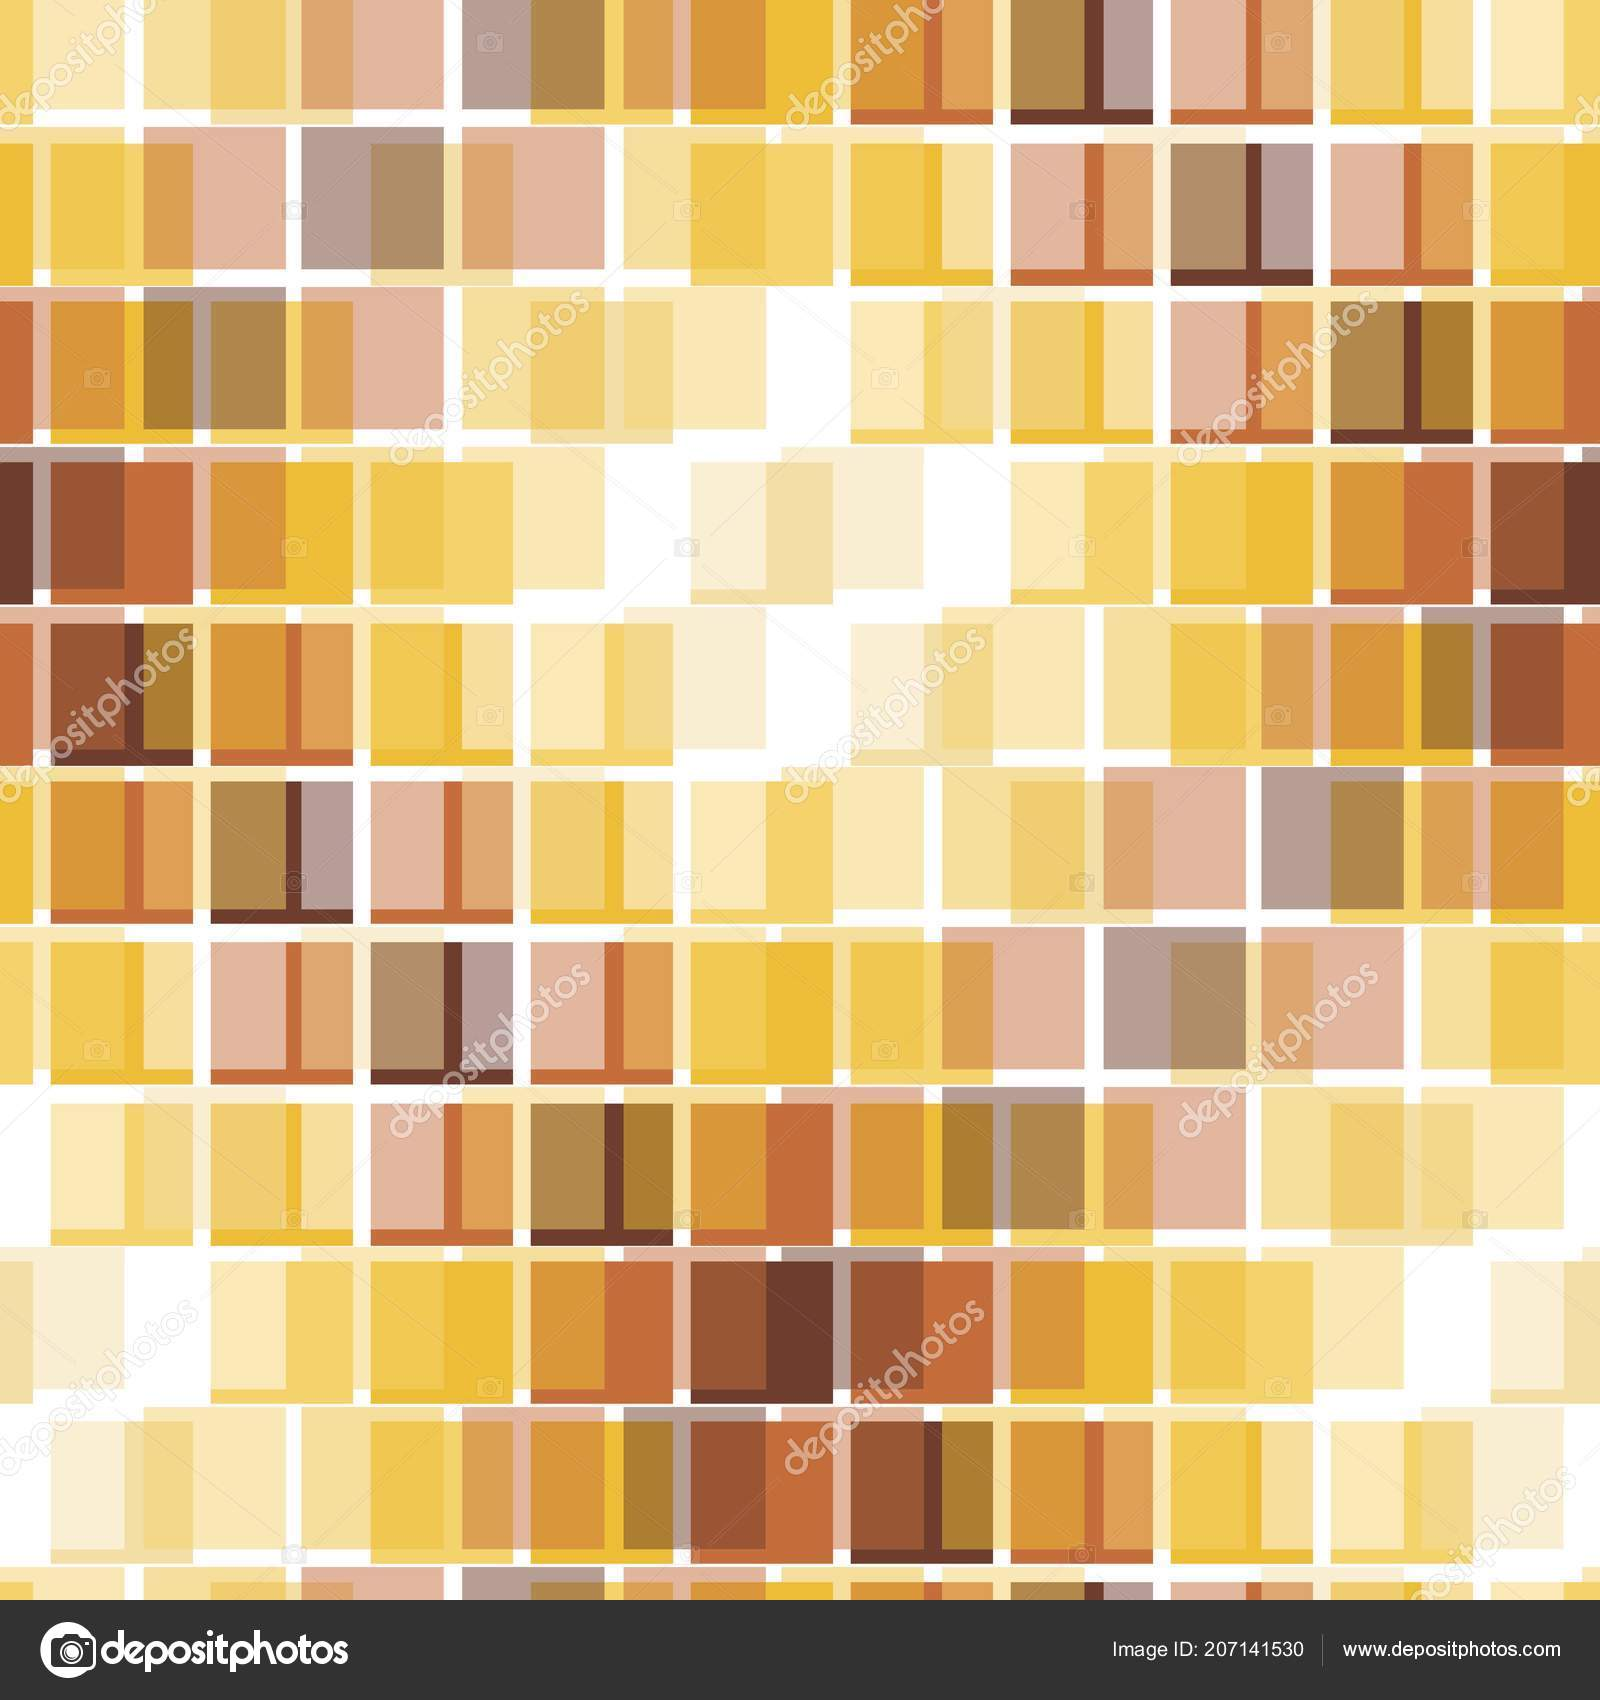 Braun Fliesen Nahtloser Vektor Muster Stockvektor C Ihor Seamless